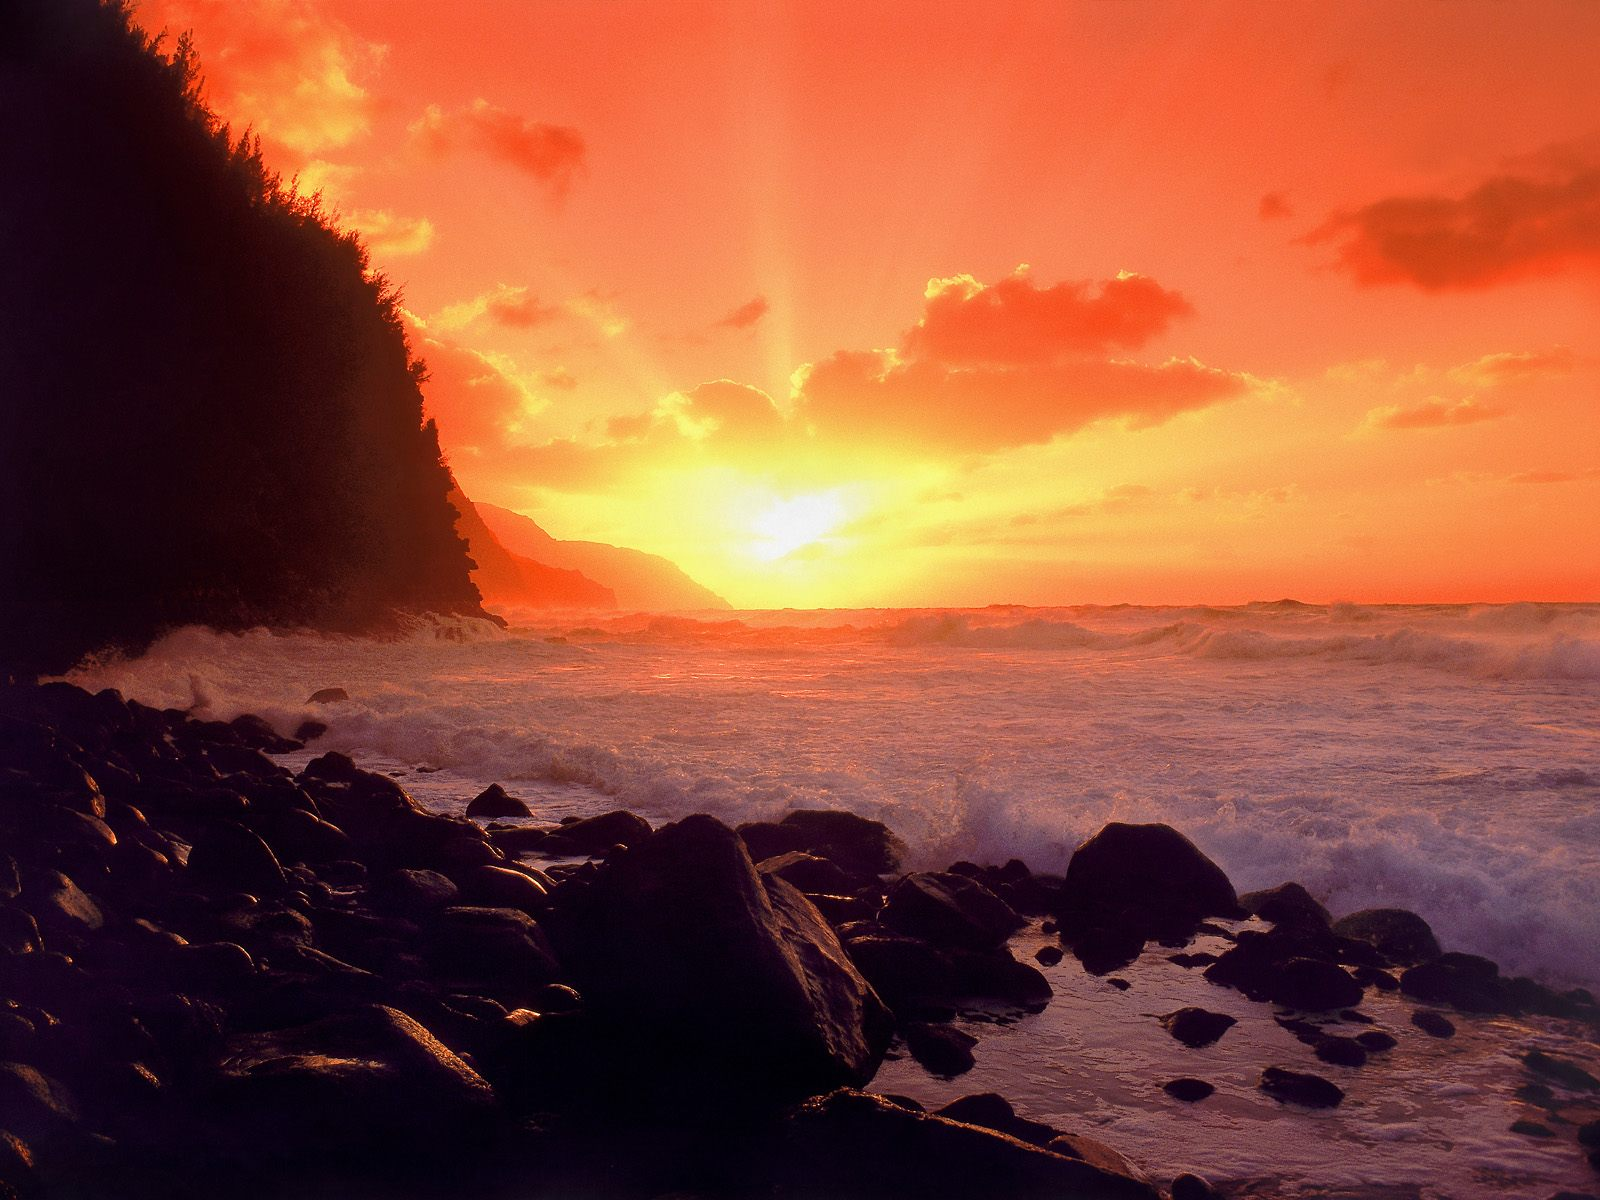 Hawaiian Sunset Wallpapers 1600x1200